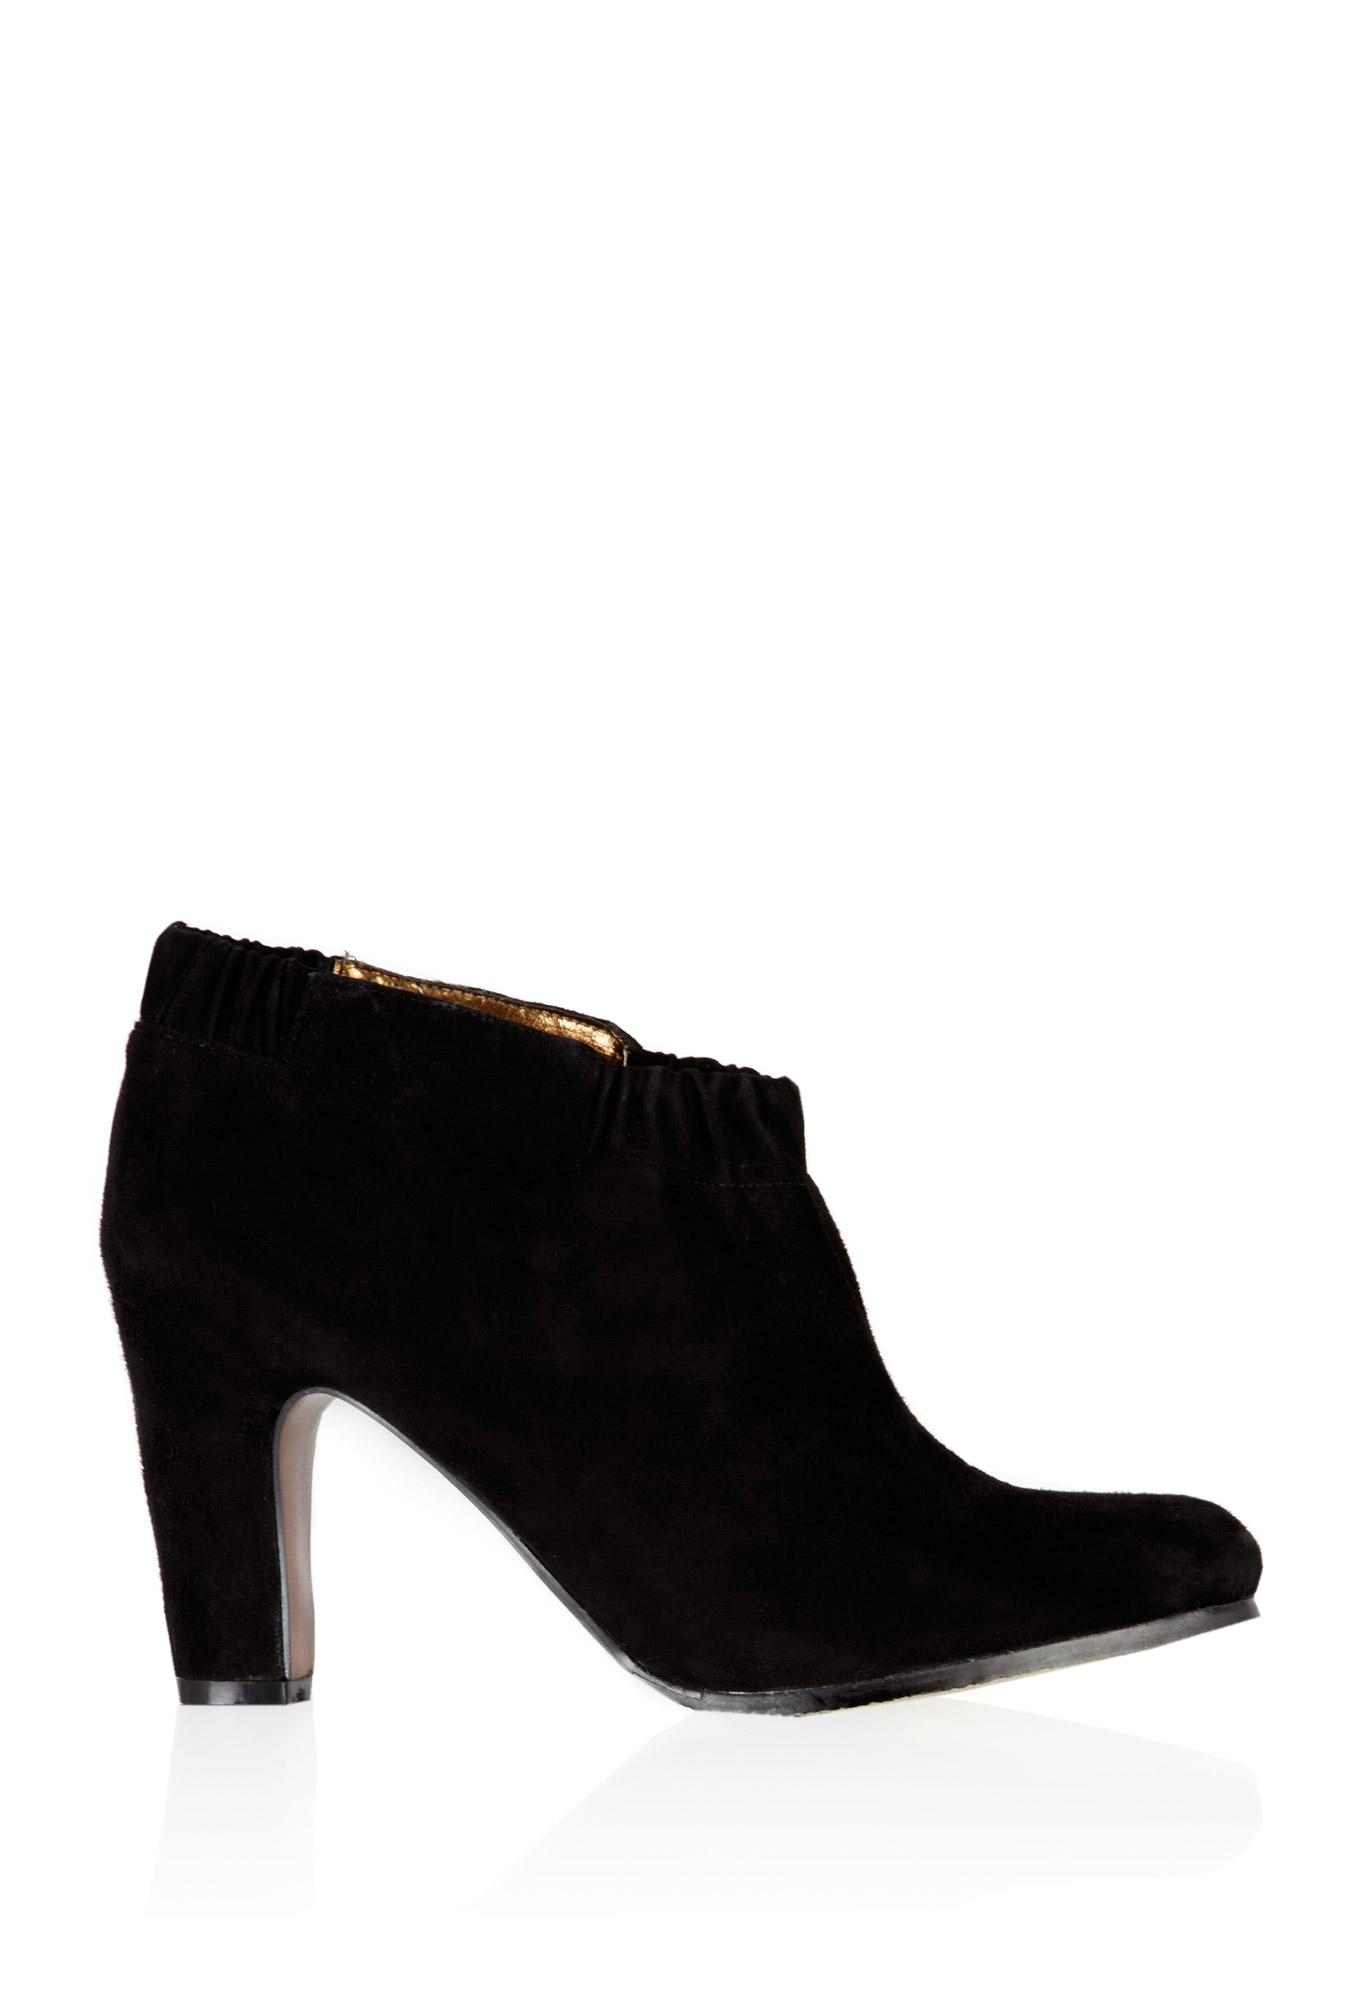 sam edelman black suede ankle boot in black lyst